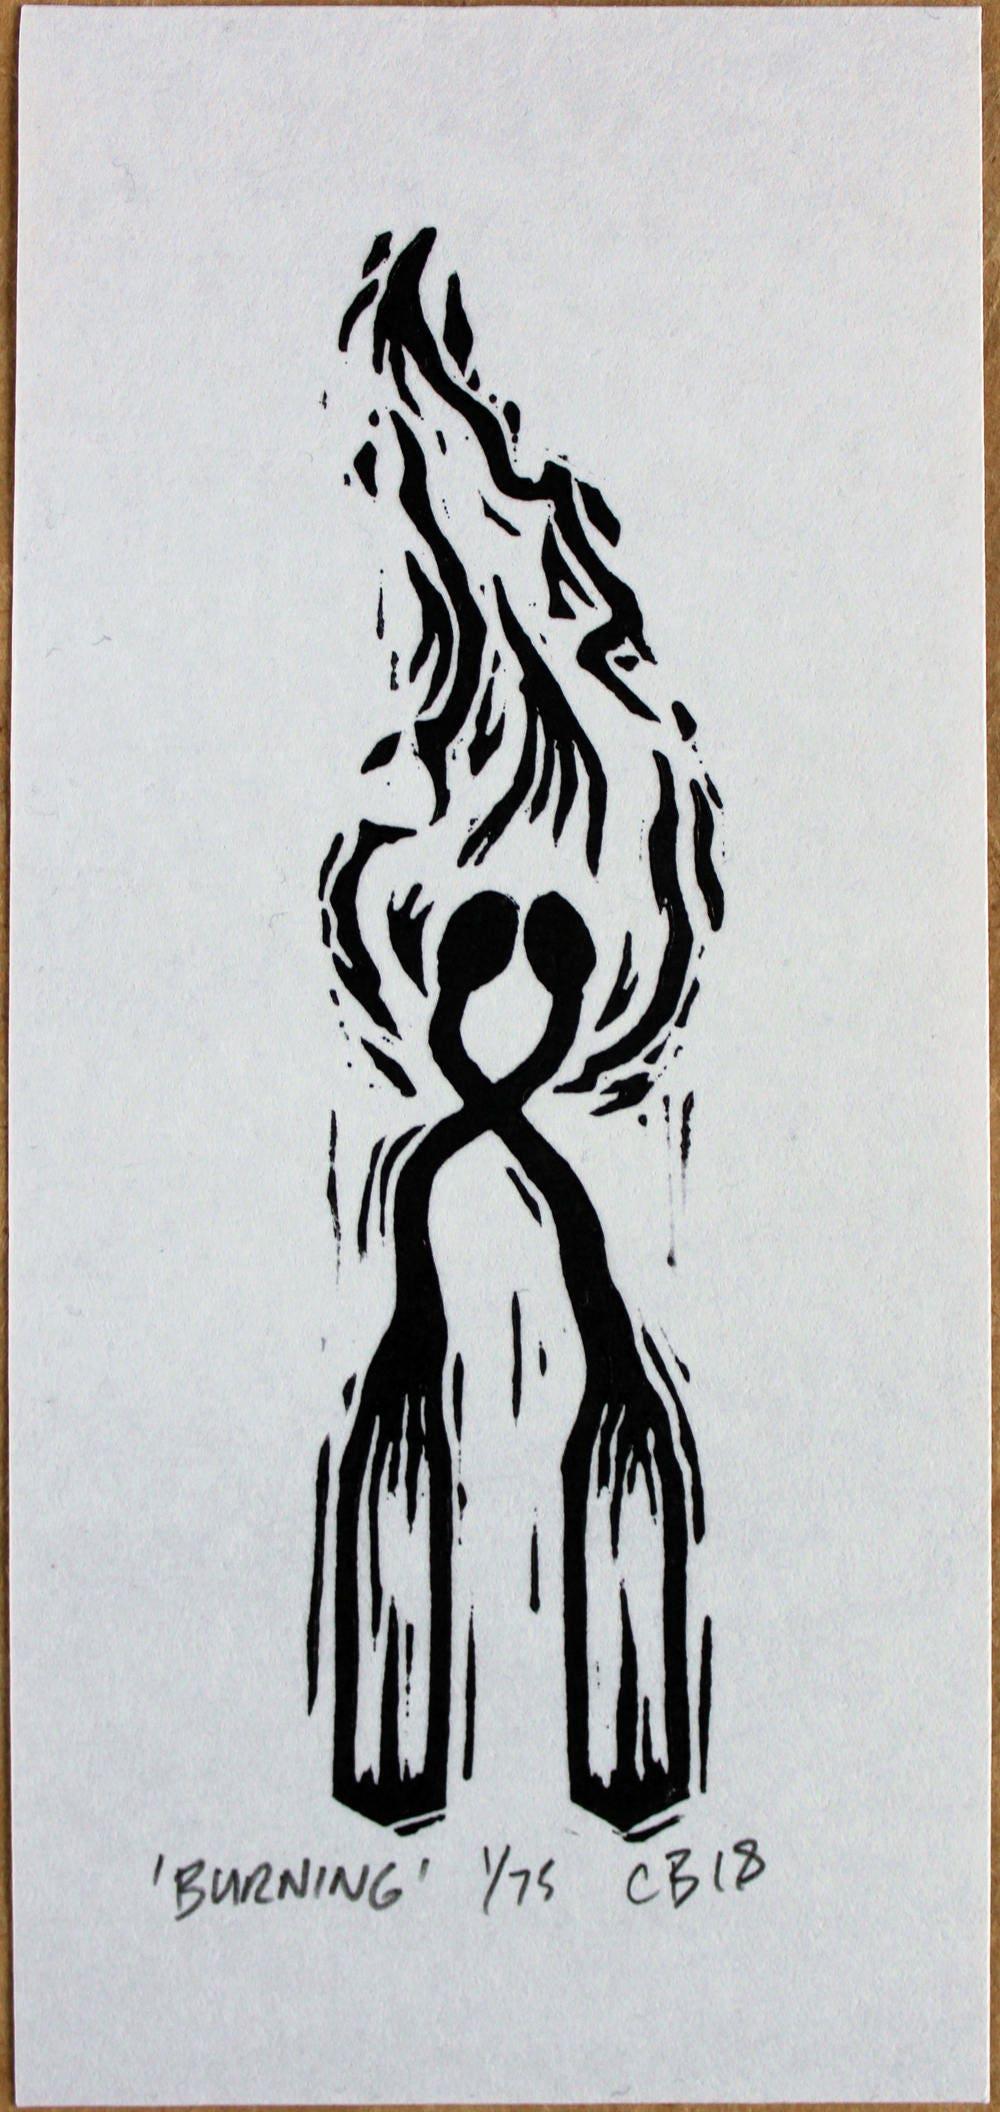 Chris Bourke Lino Print Linocut artist